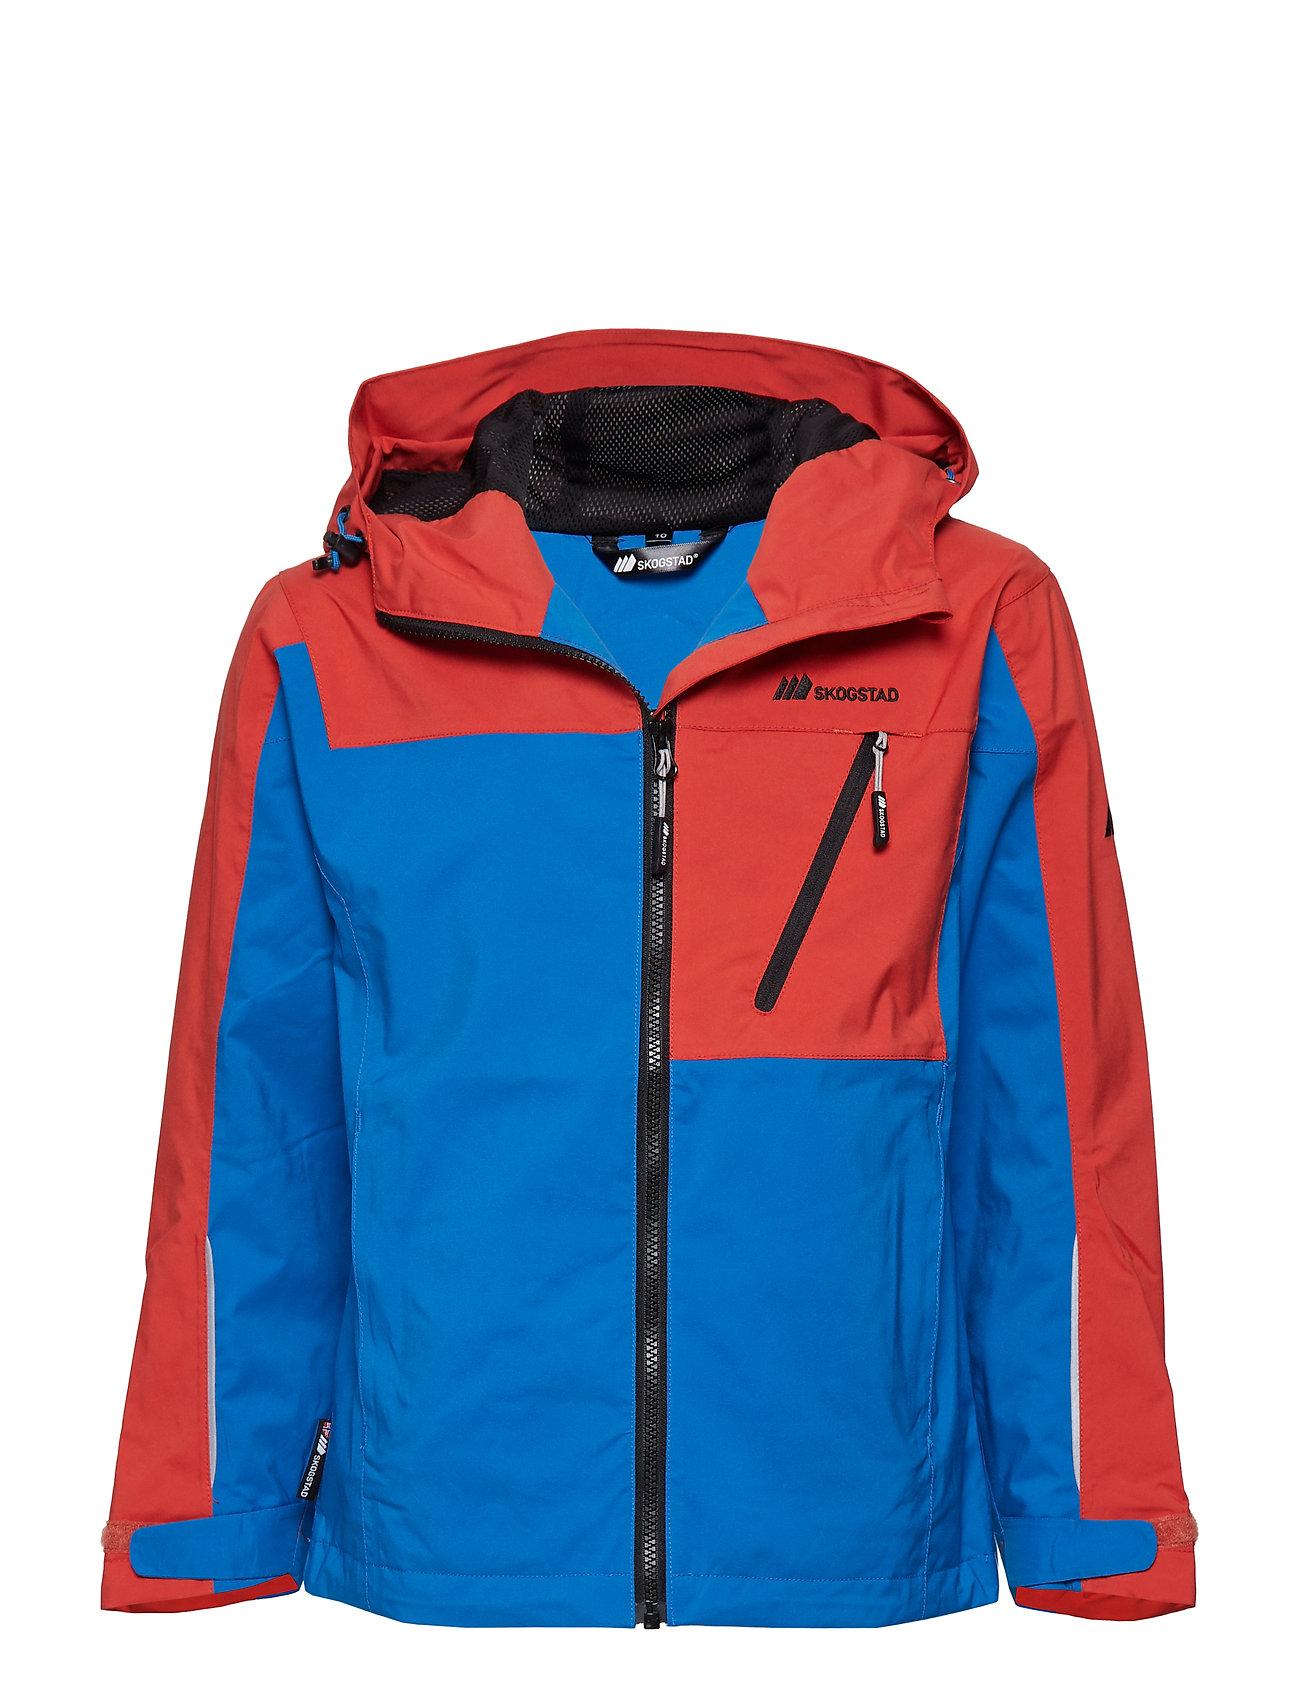 Skogstad Kabelvåg 2-Layer Technical Jacket - PRIMARY BLUE